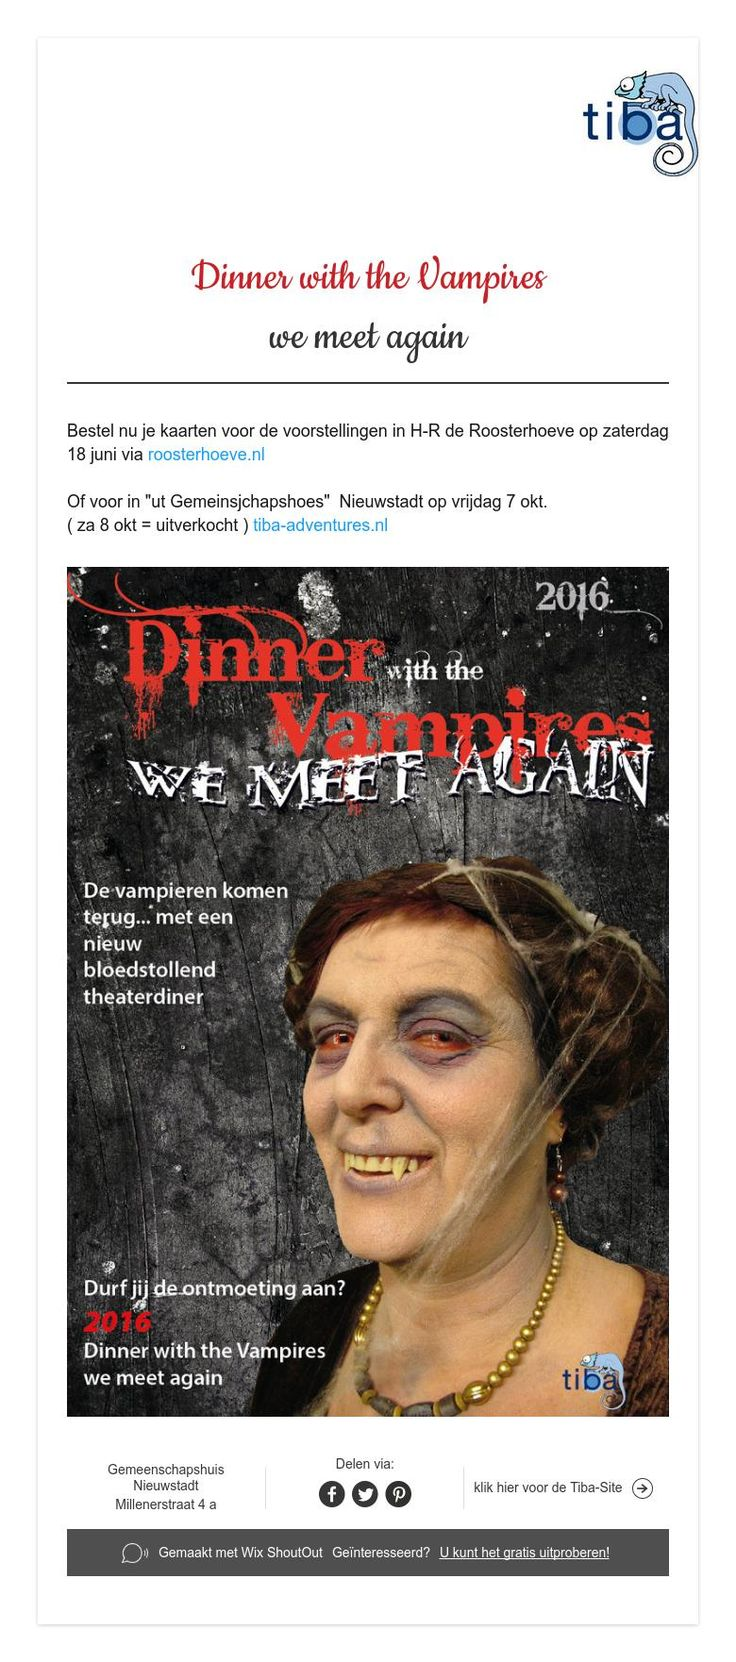 Dinner with the Vampires  we meet again